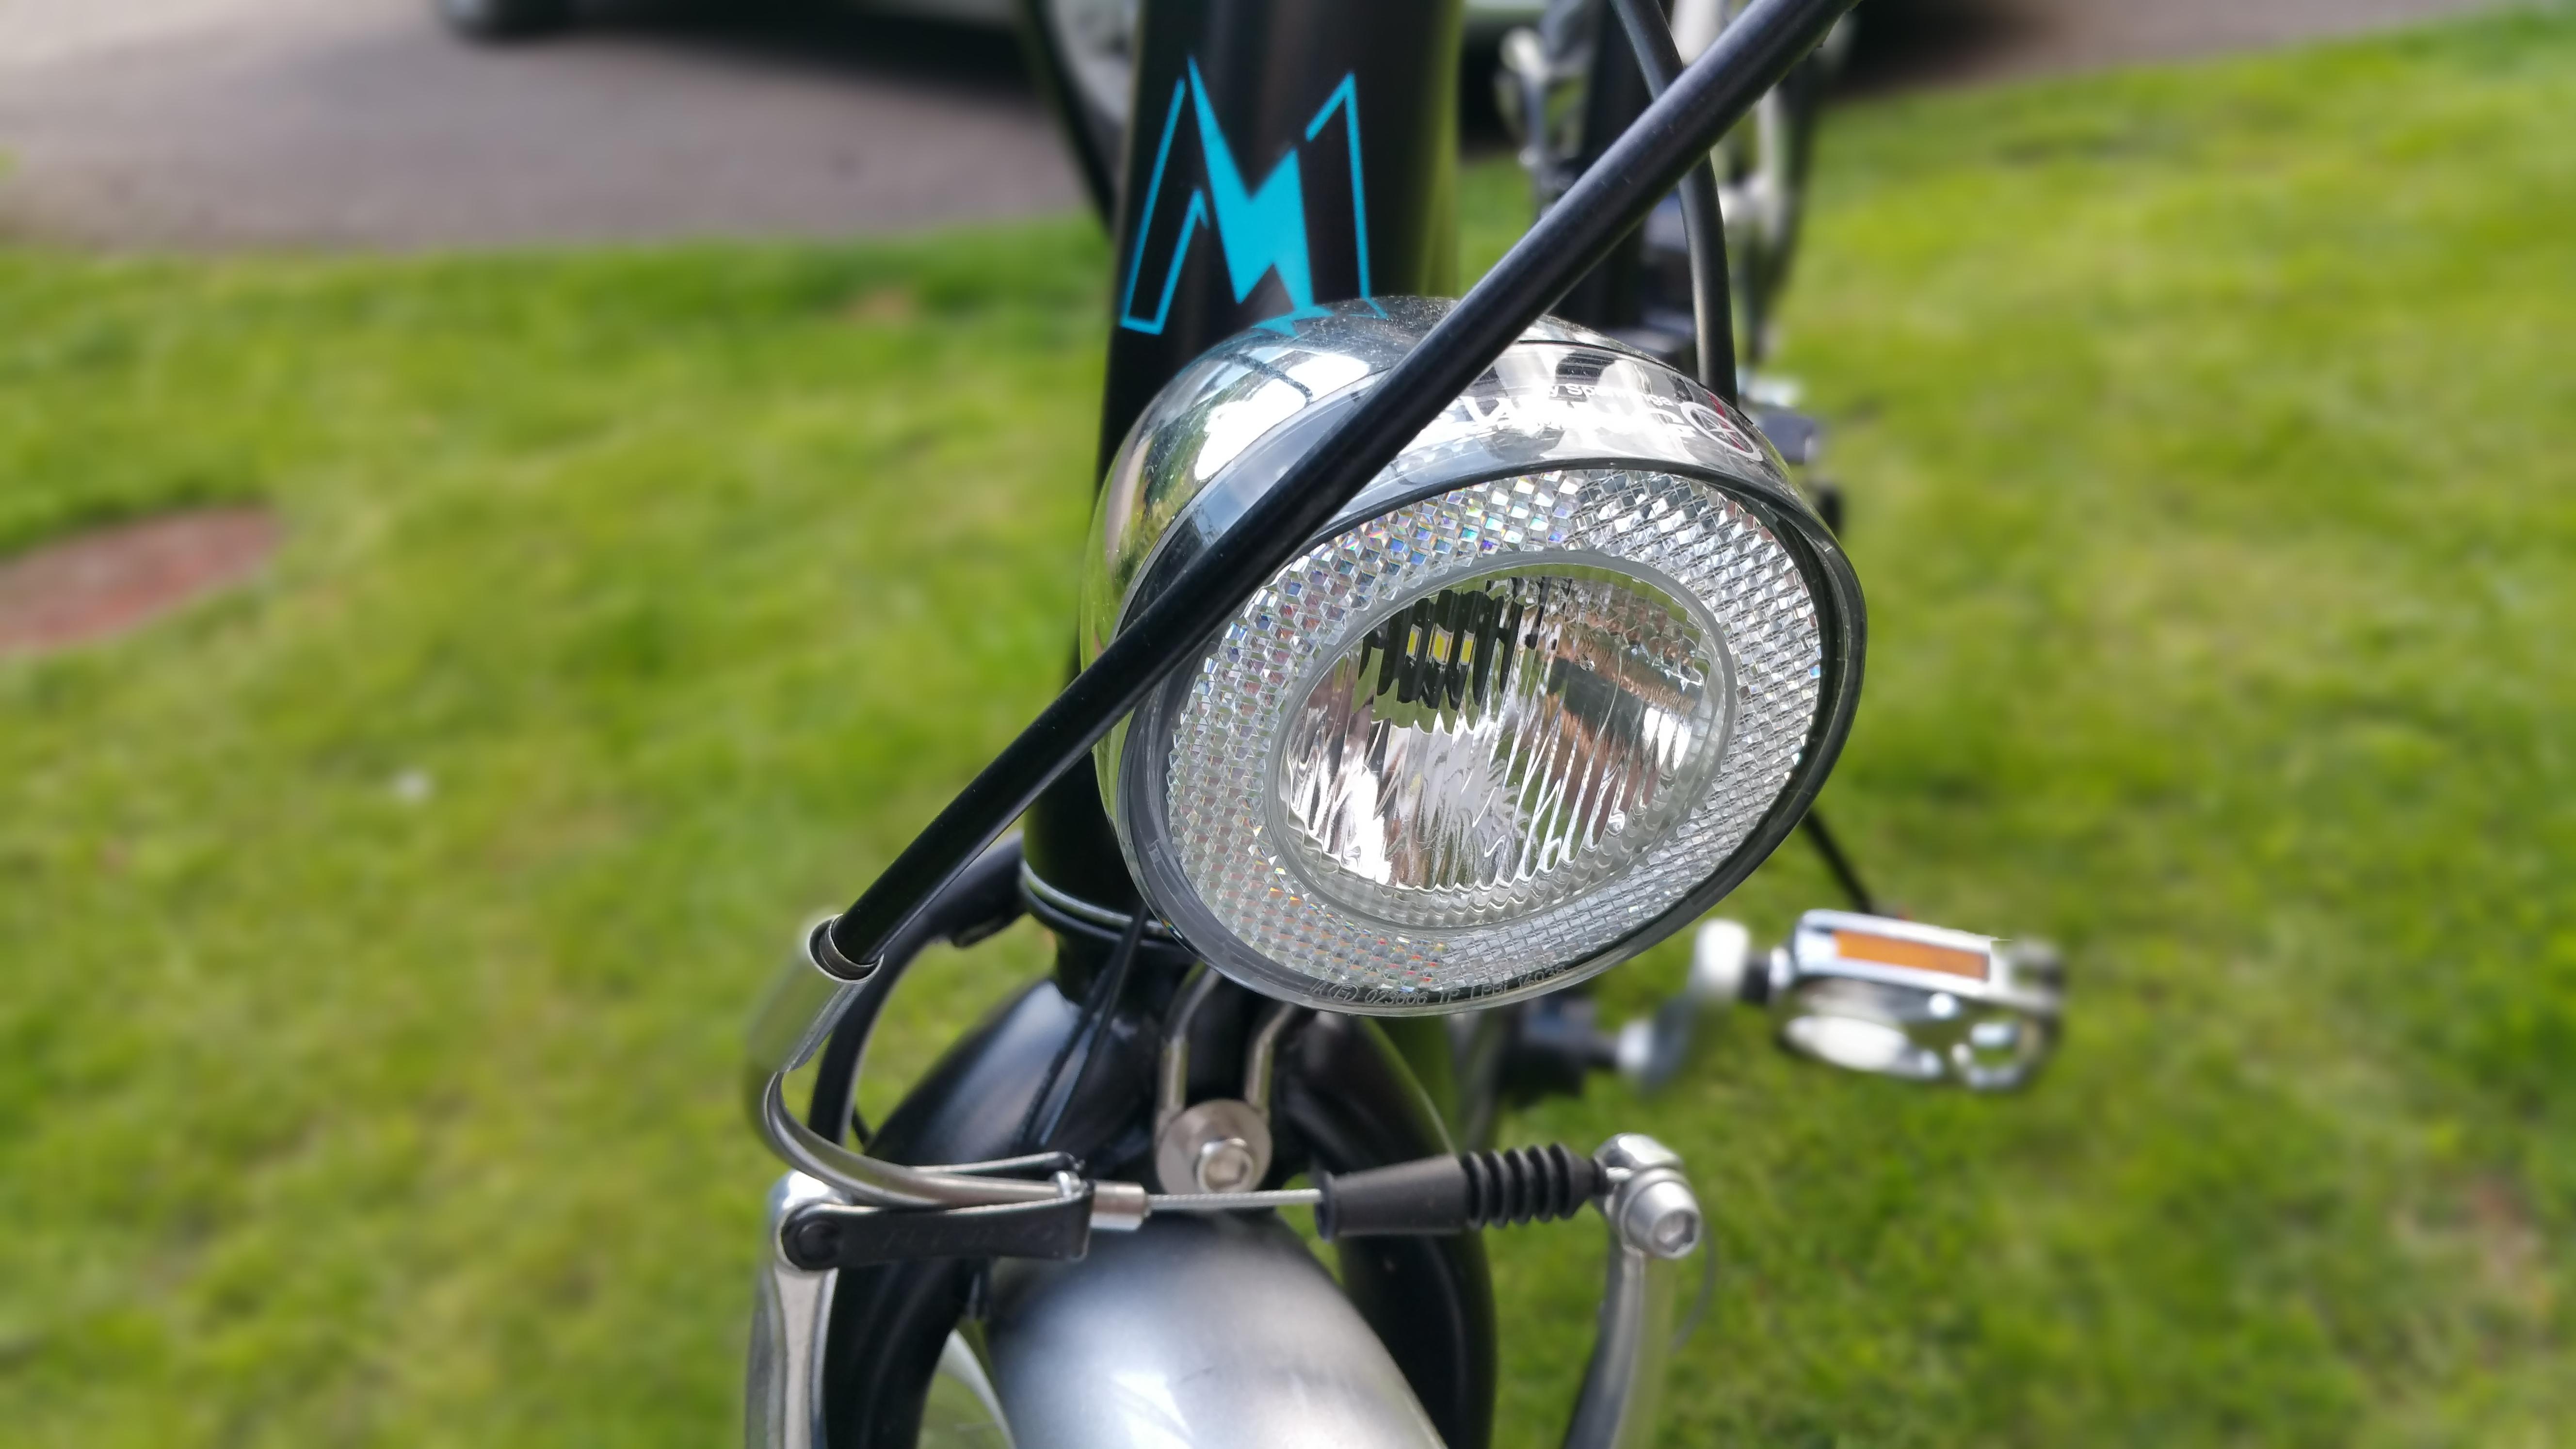 momentum-model-t-spanninga-front-led-light